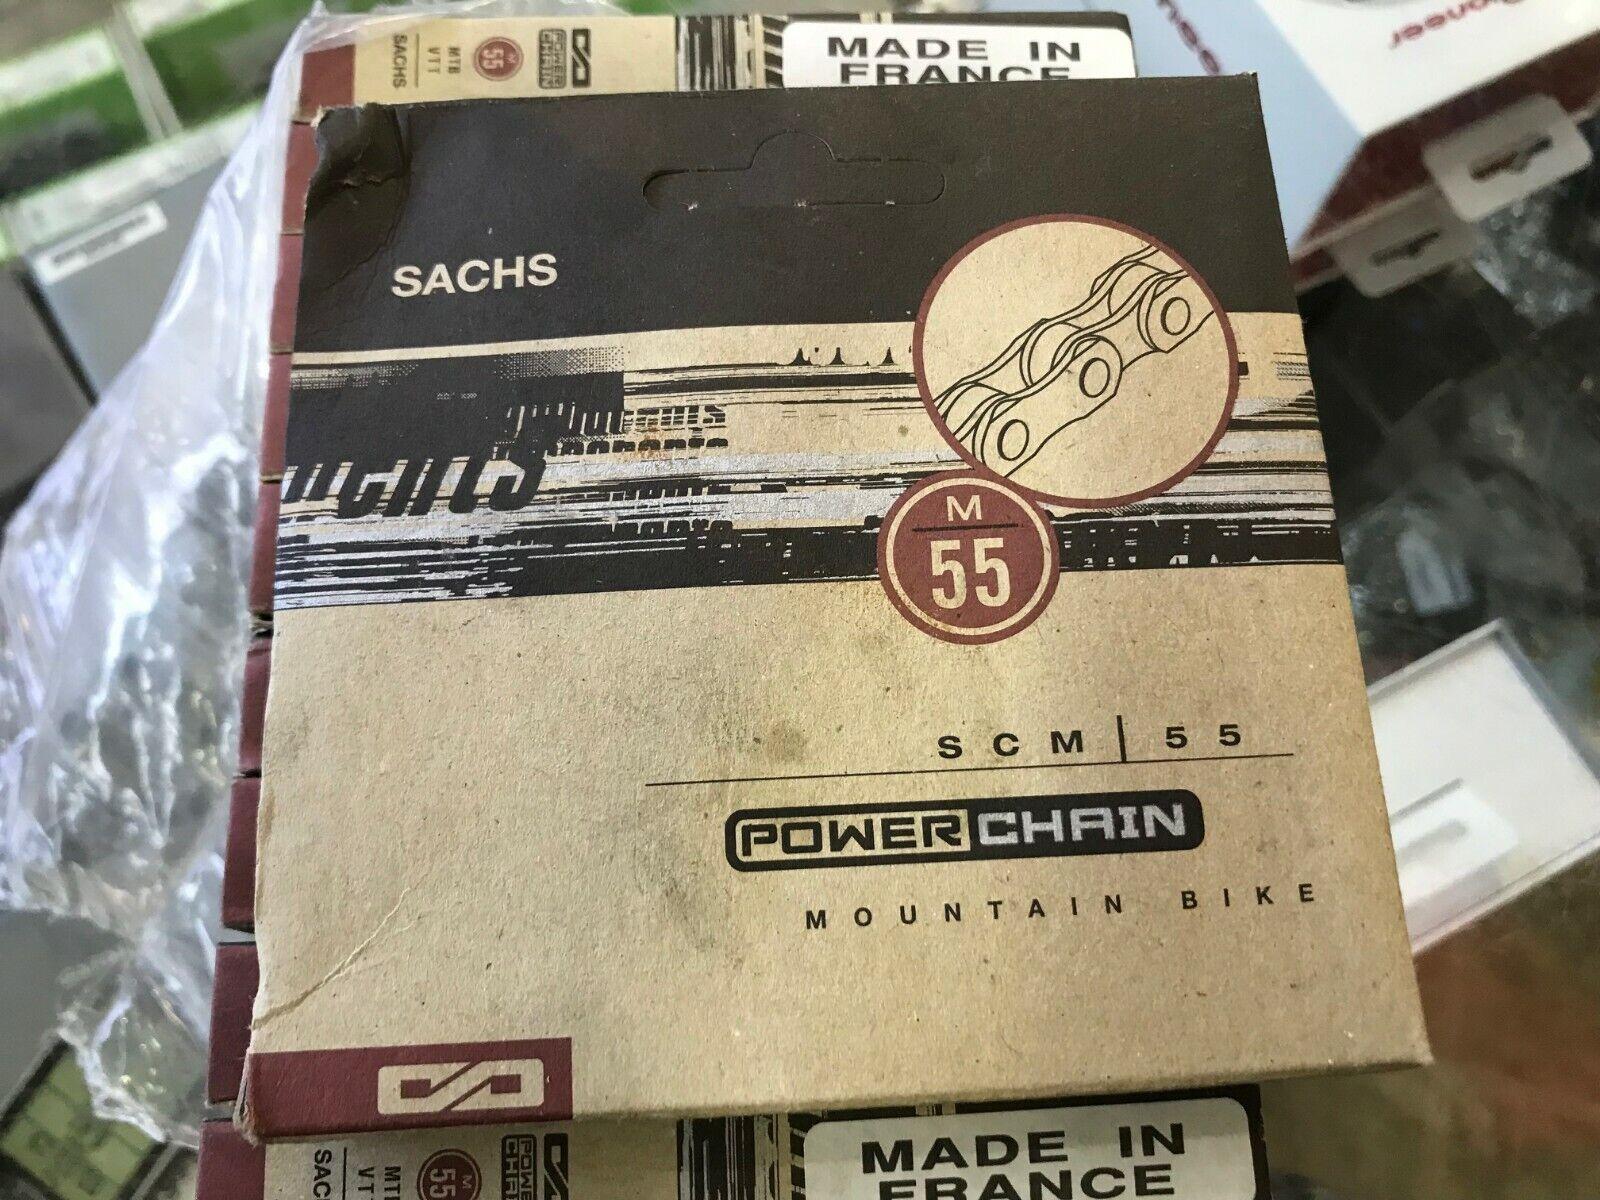 New Sachs SCM 55 Chain Mountain Road Bike 5 speed 6 speed 7 speed